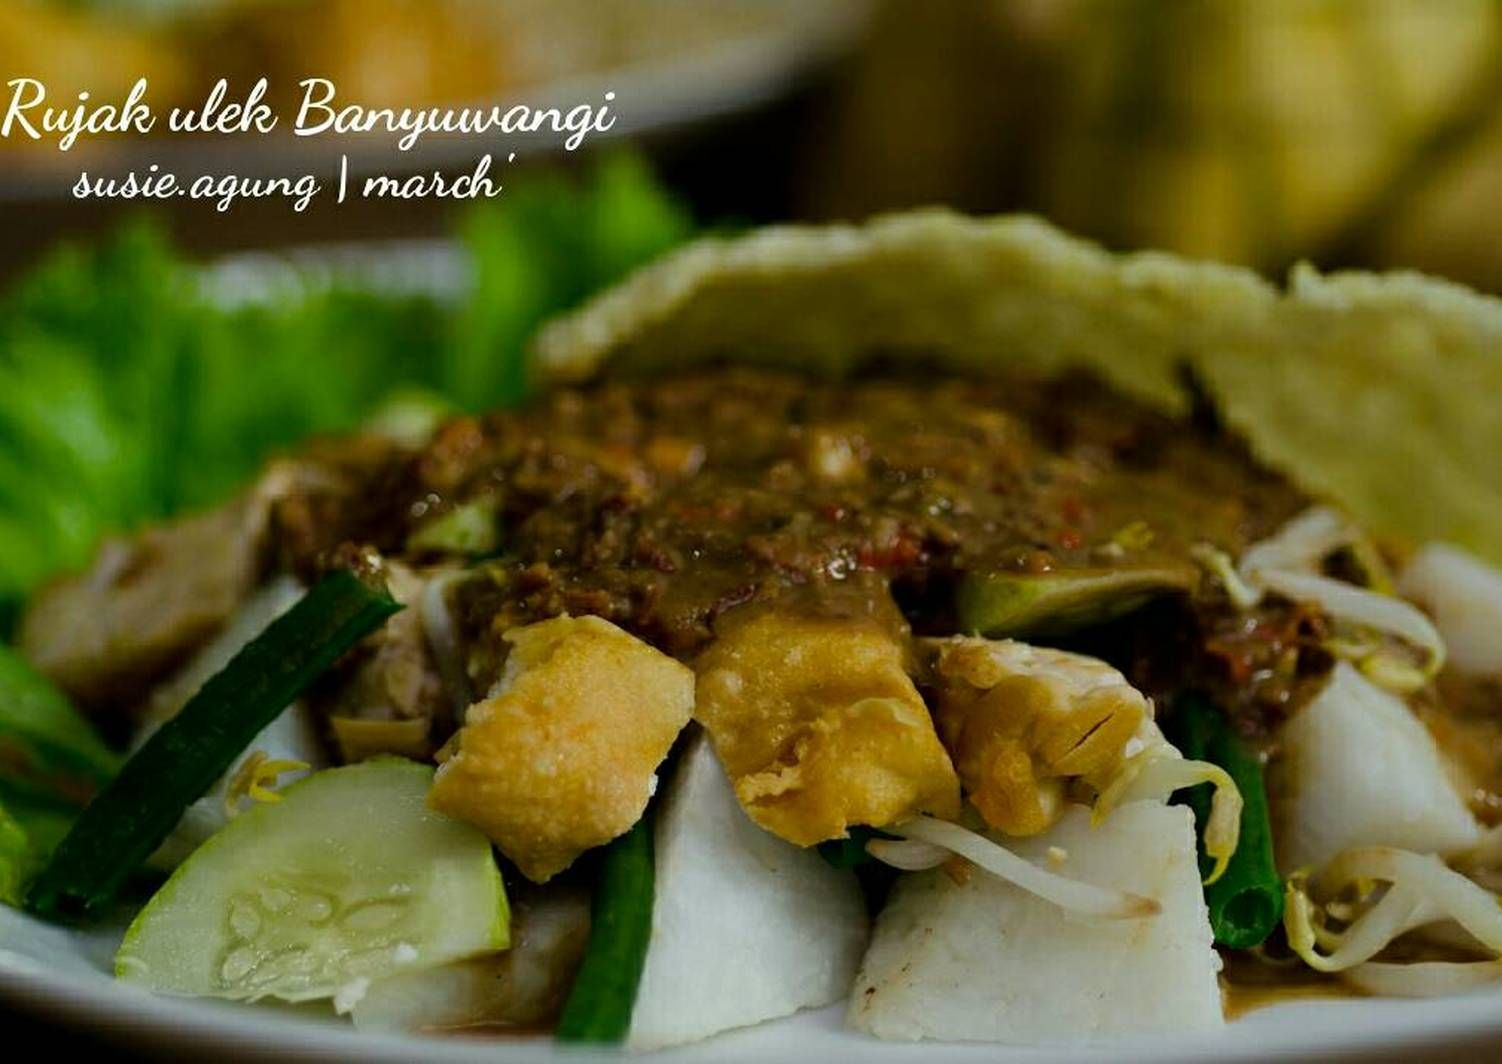 Resep Rujak Ulek Khas Banyuwangi Oleh Susi Agung Resep Makan Siang Makanan Resep